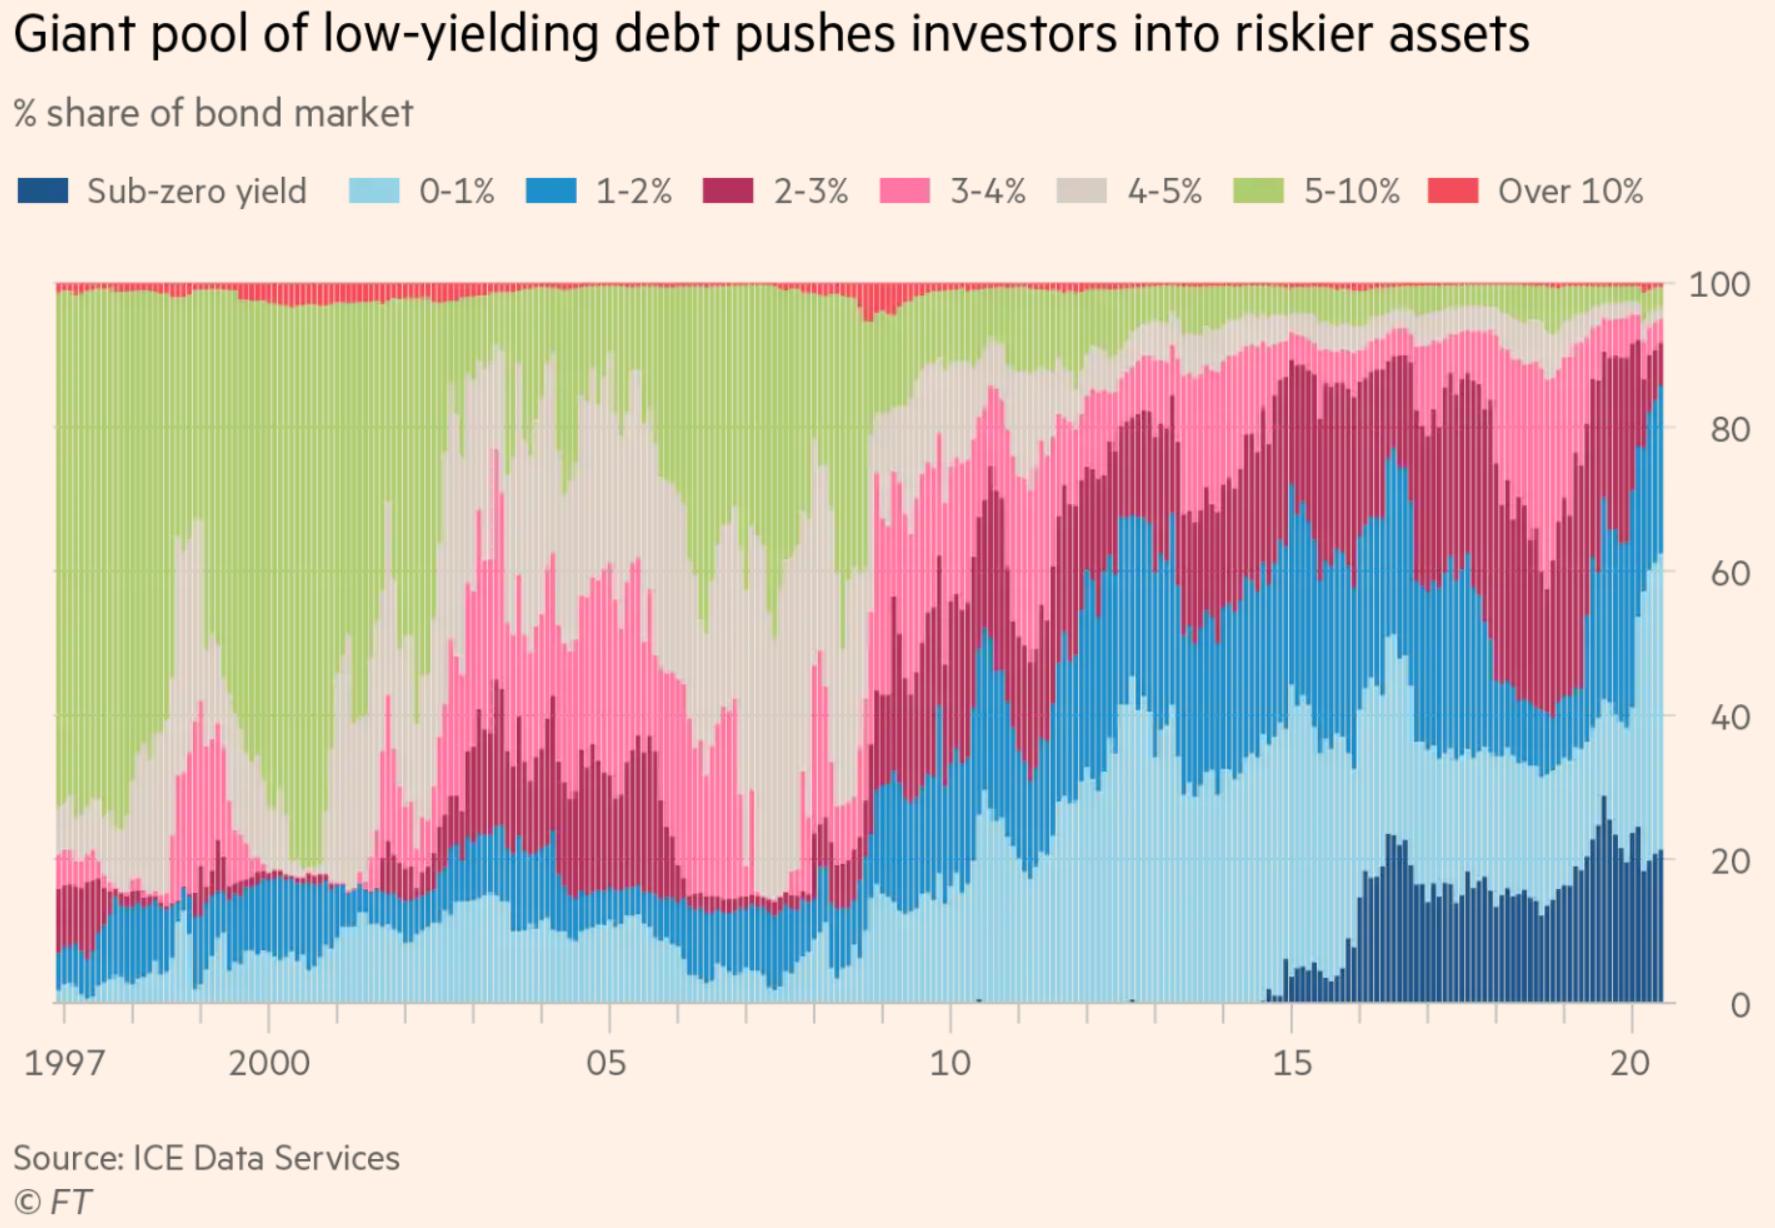 Low-yielding debt